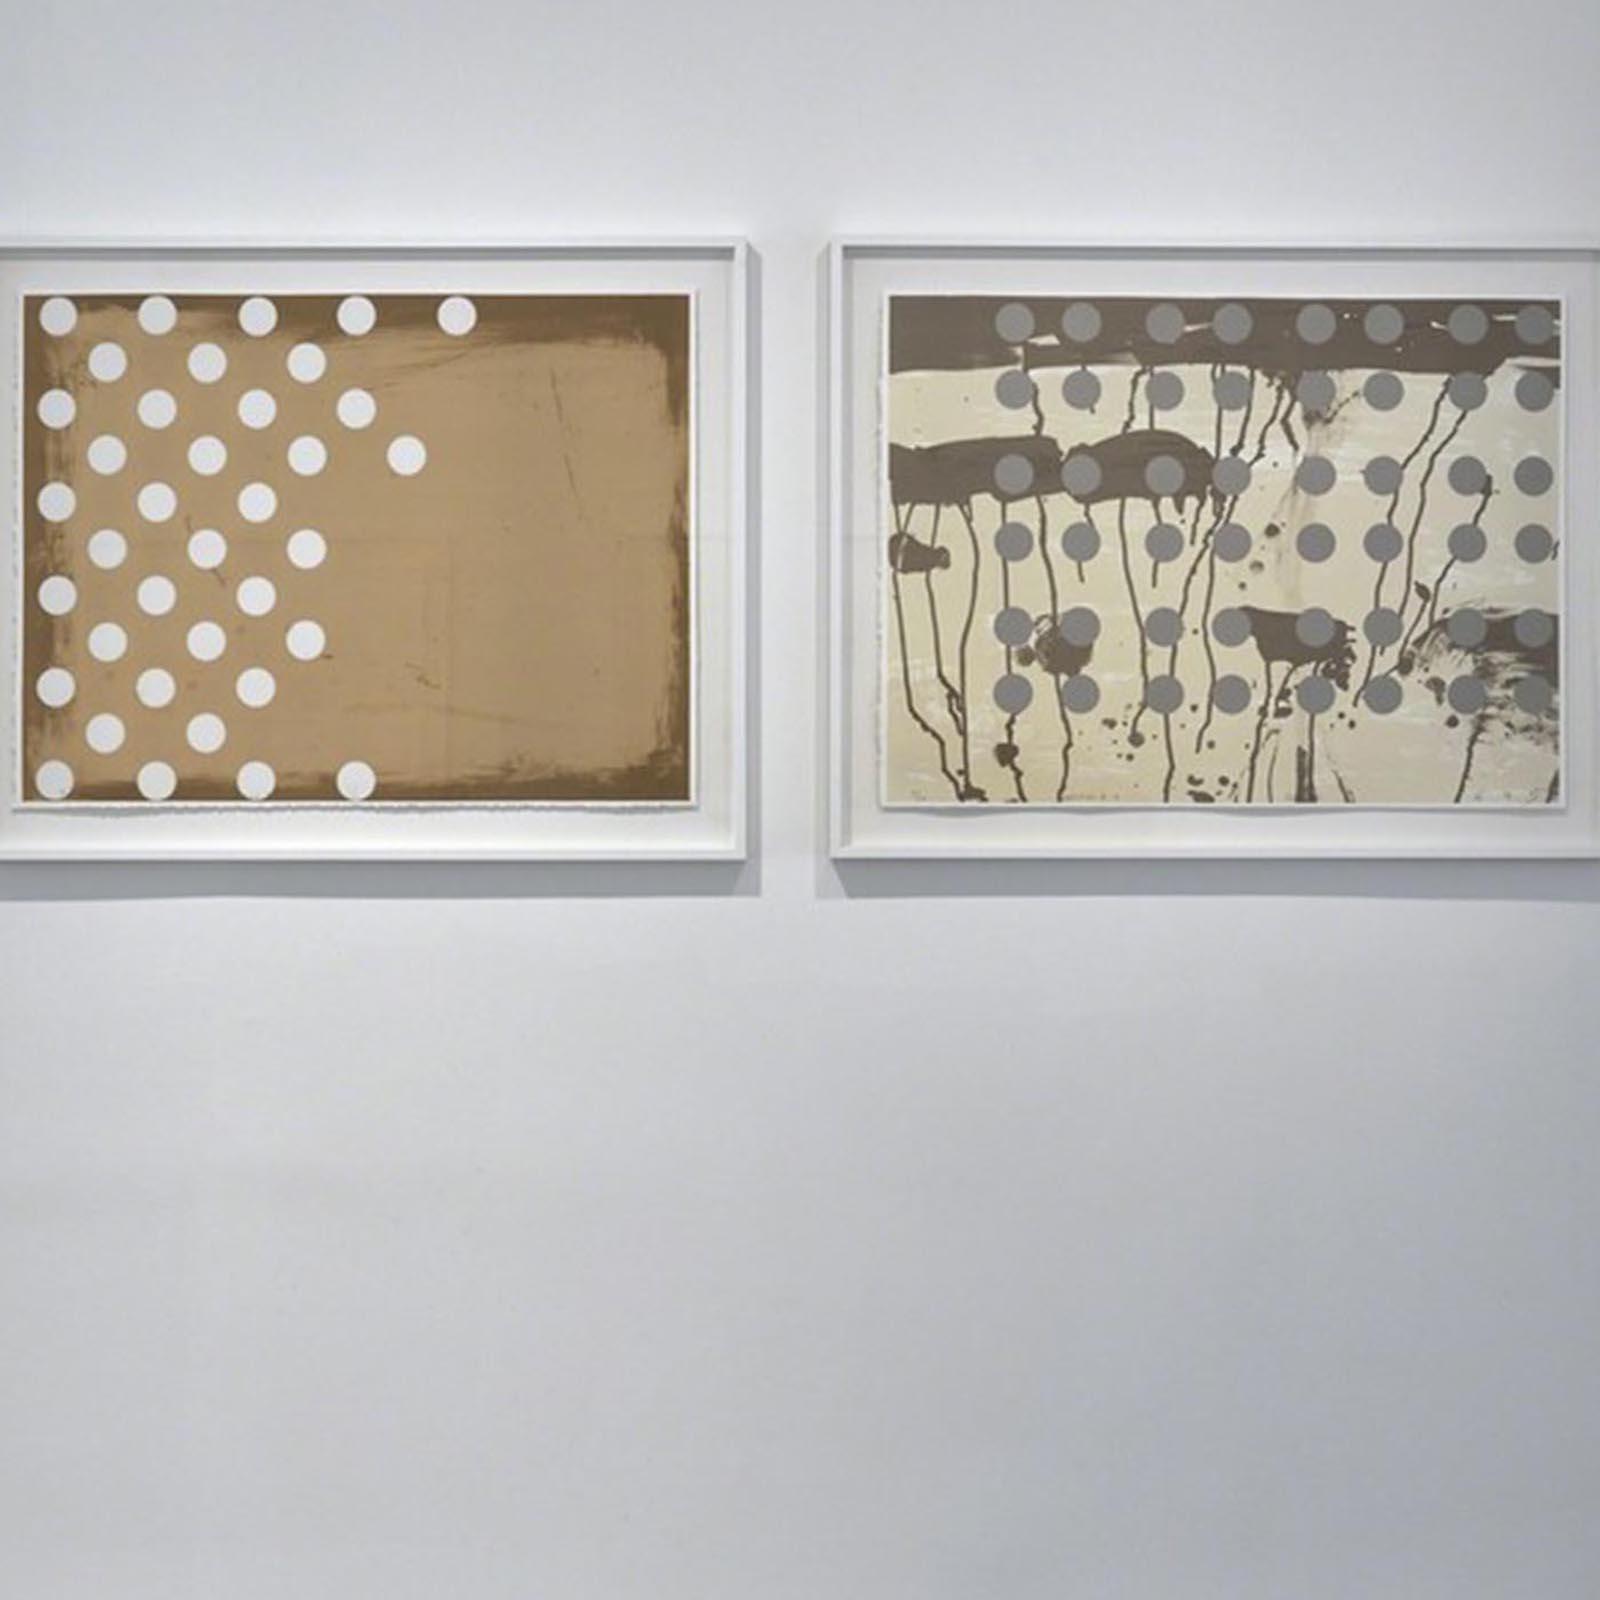 Kim Yong-Ik – untitled utopias